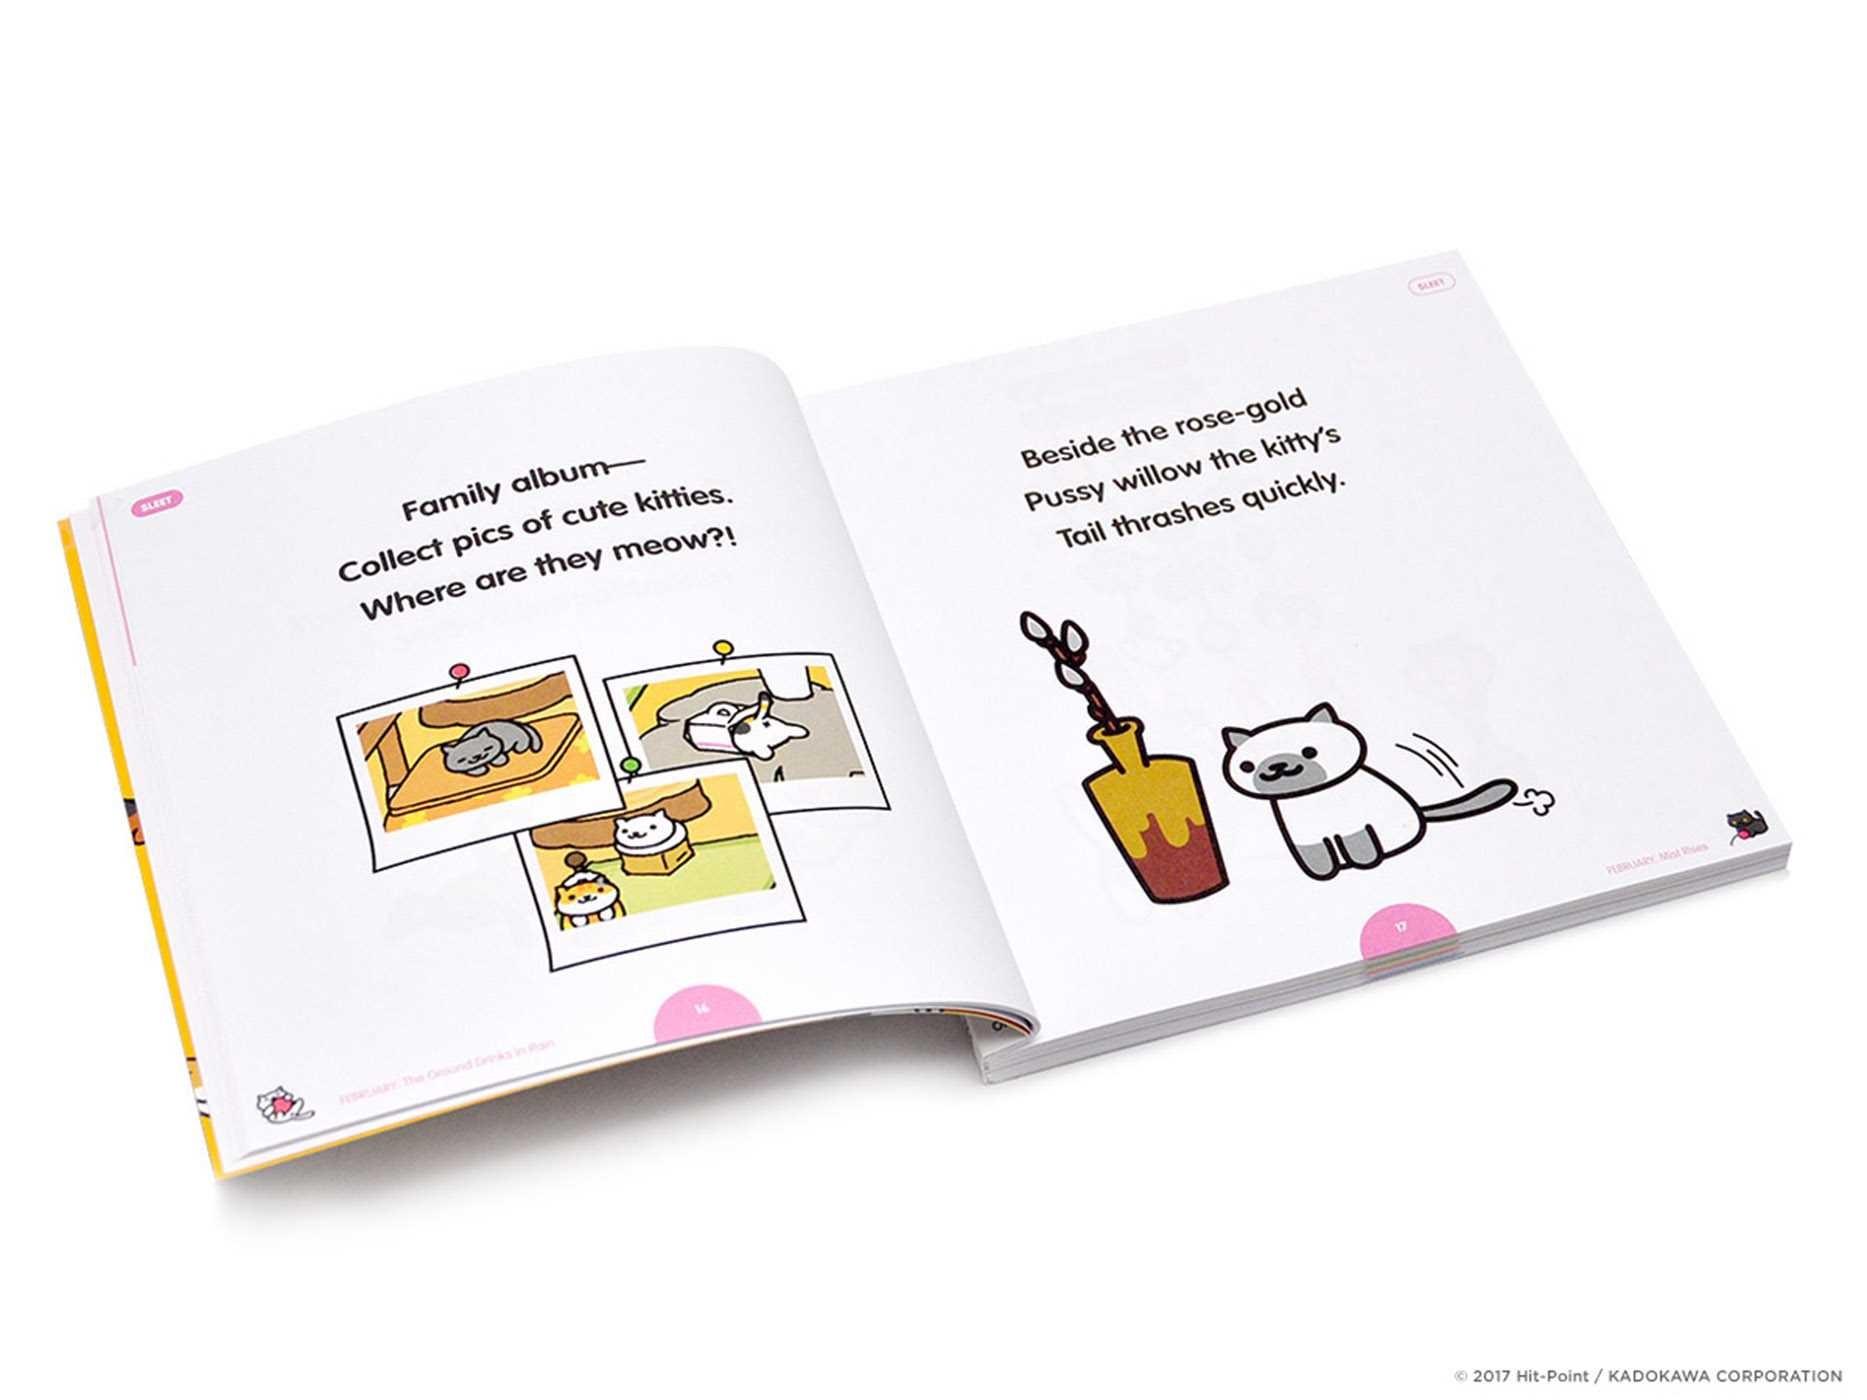 Neko atsume kitty collector haiku seasons of the kitty 9781421598024.in03